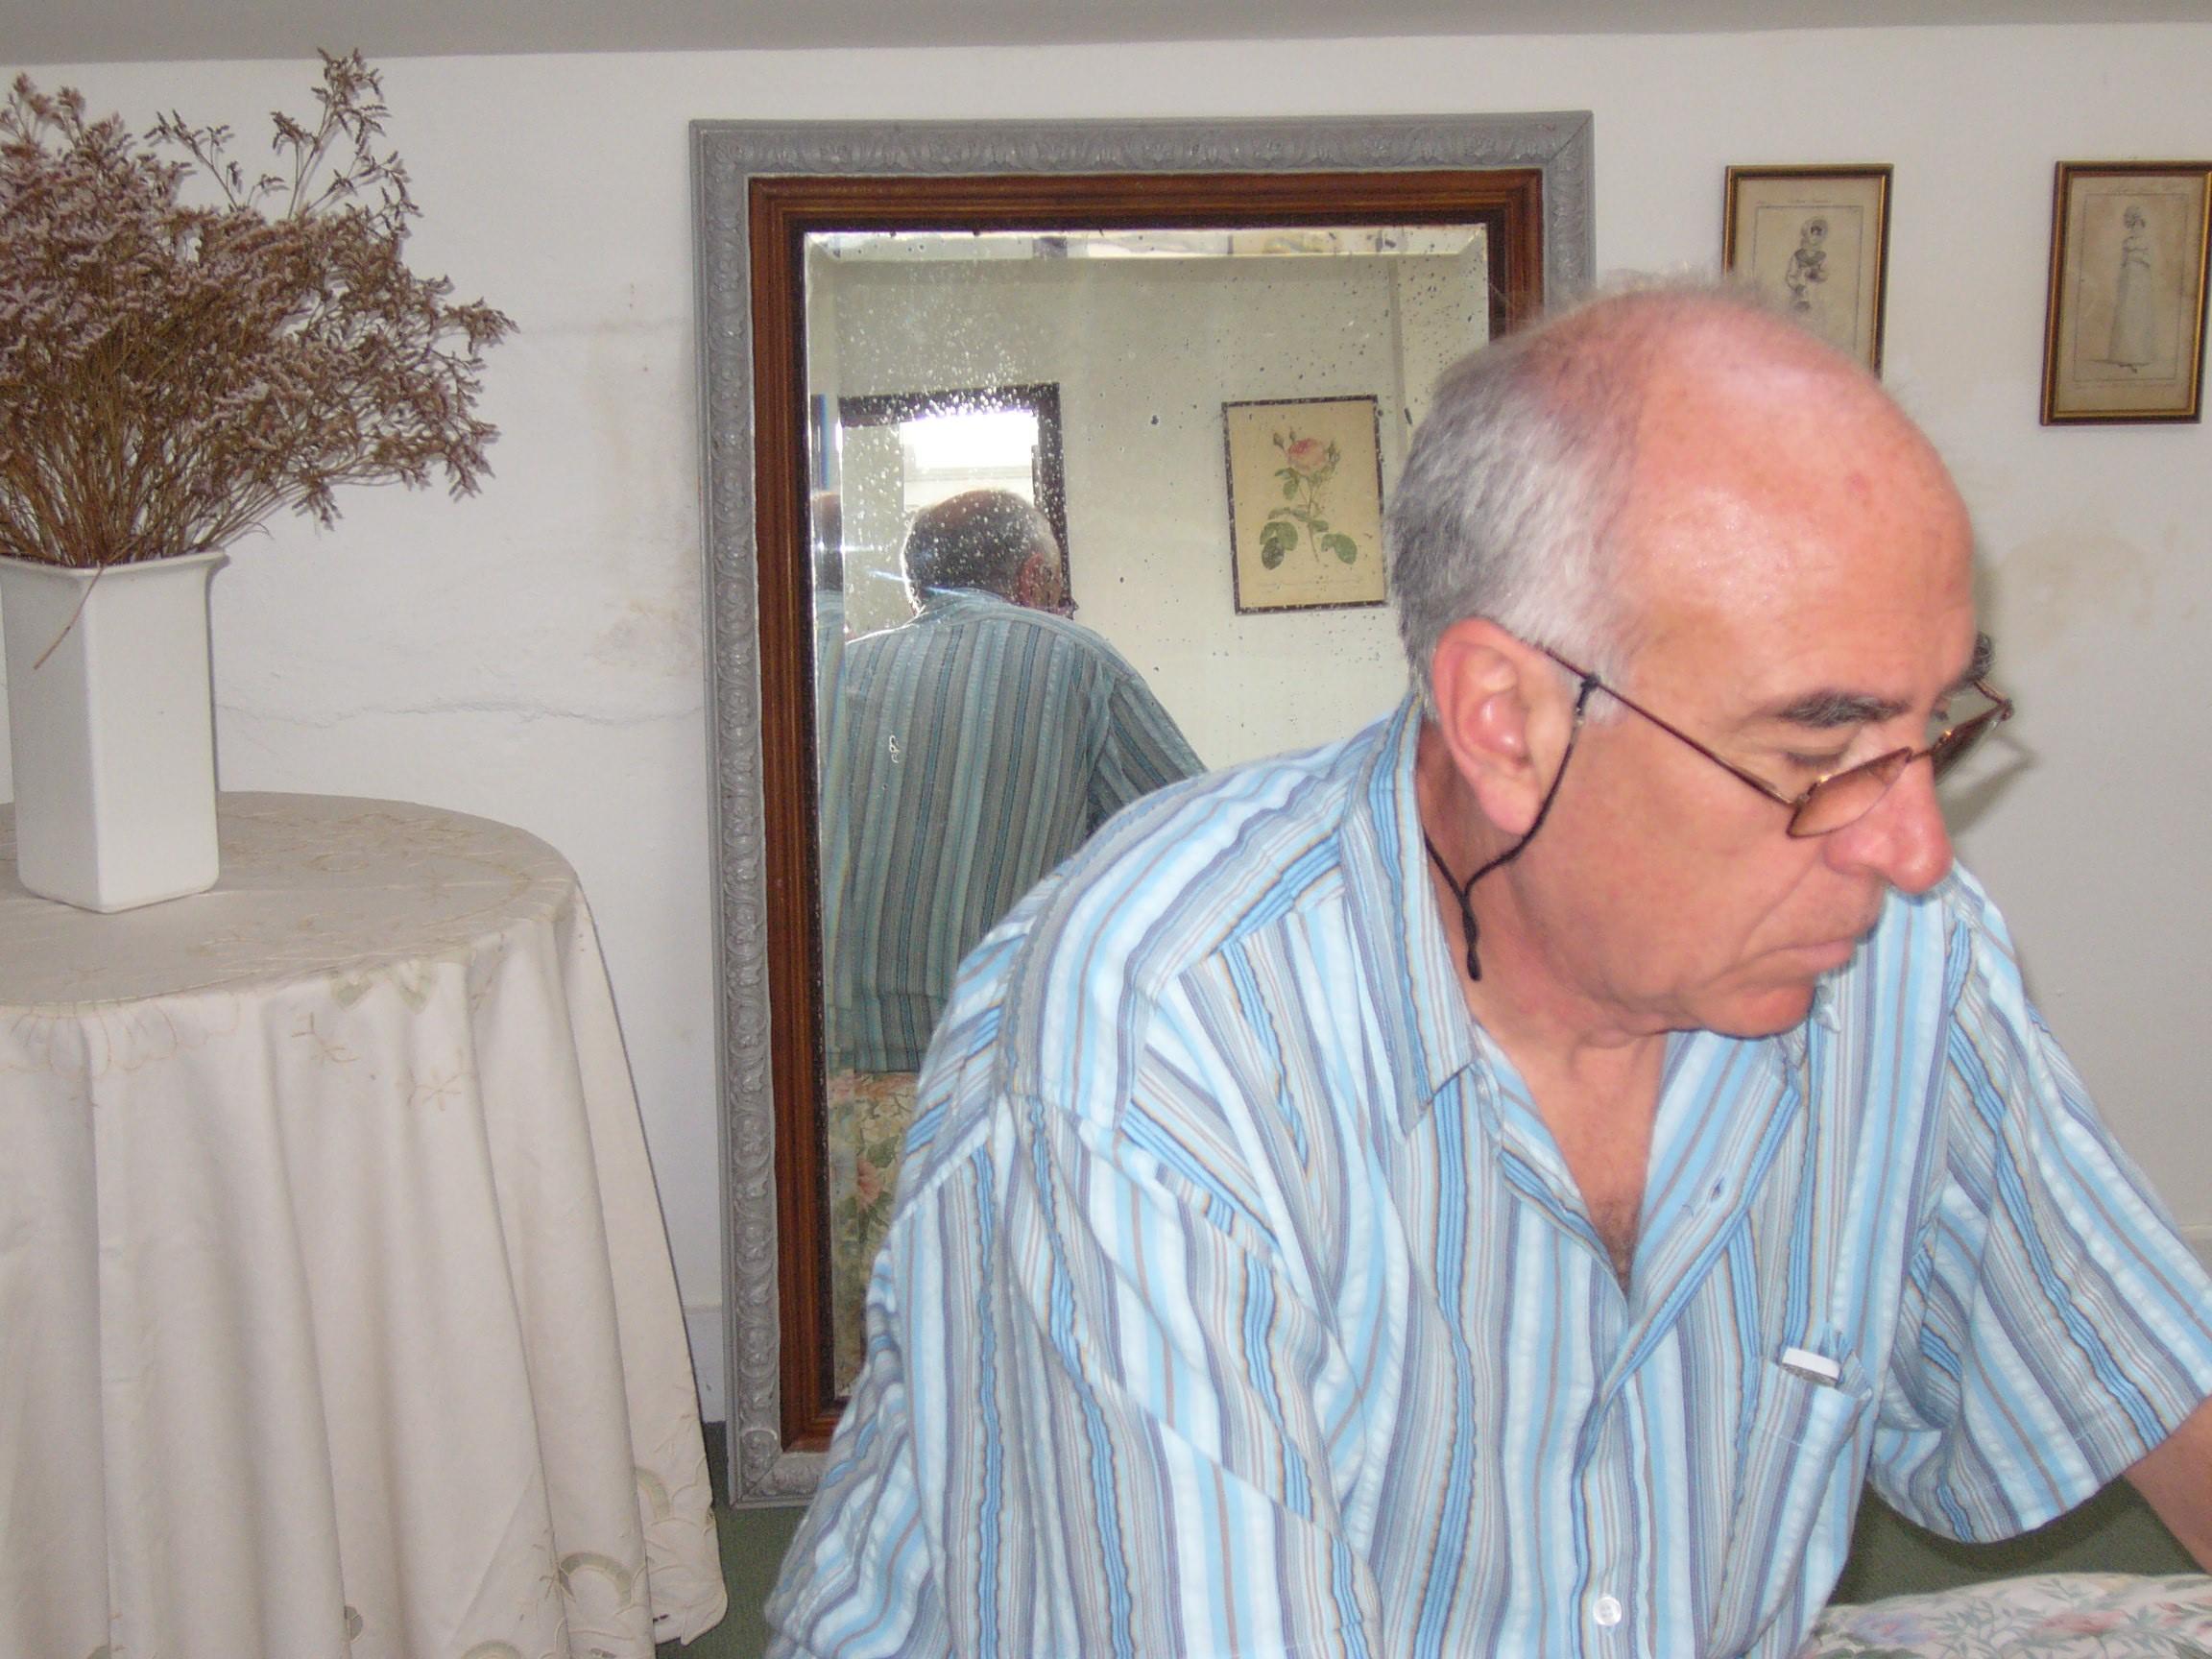 Jean-Louis BRESSON